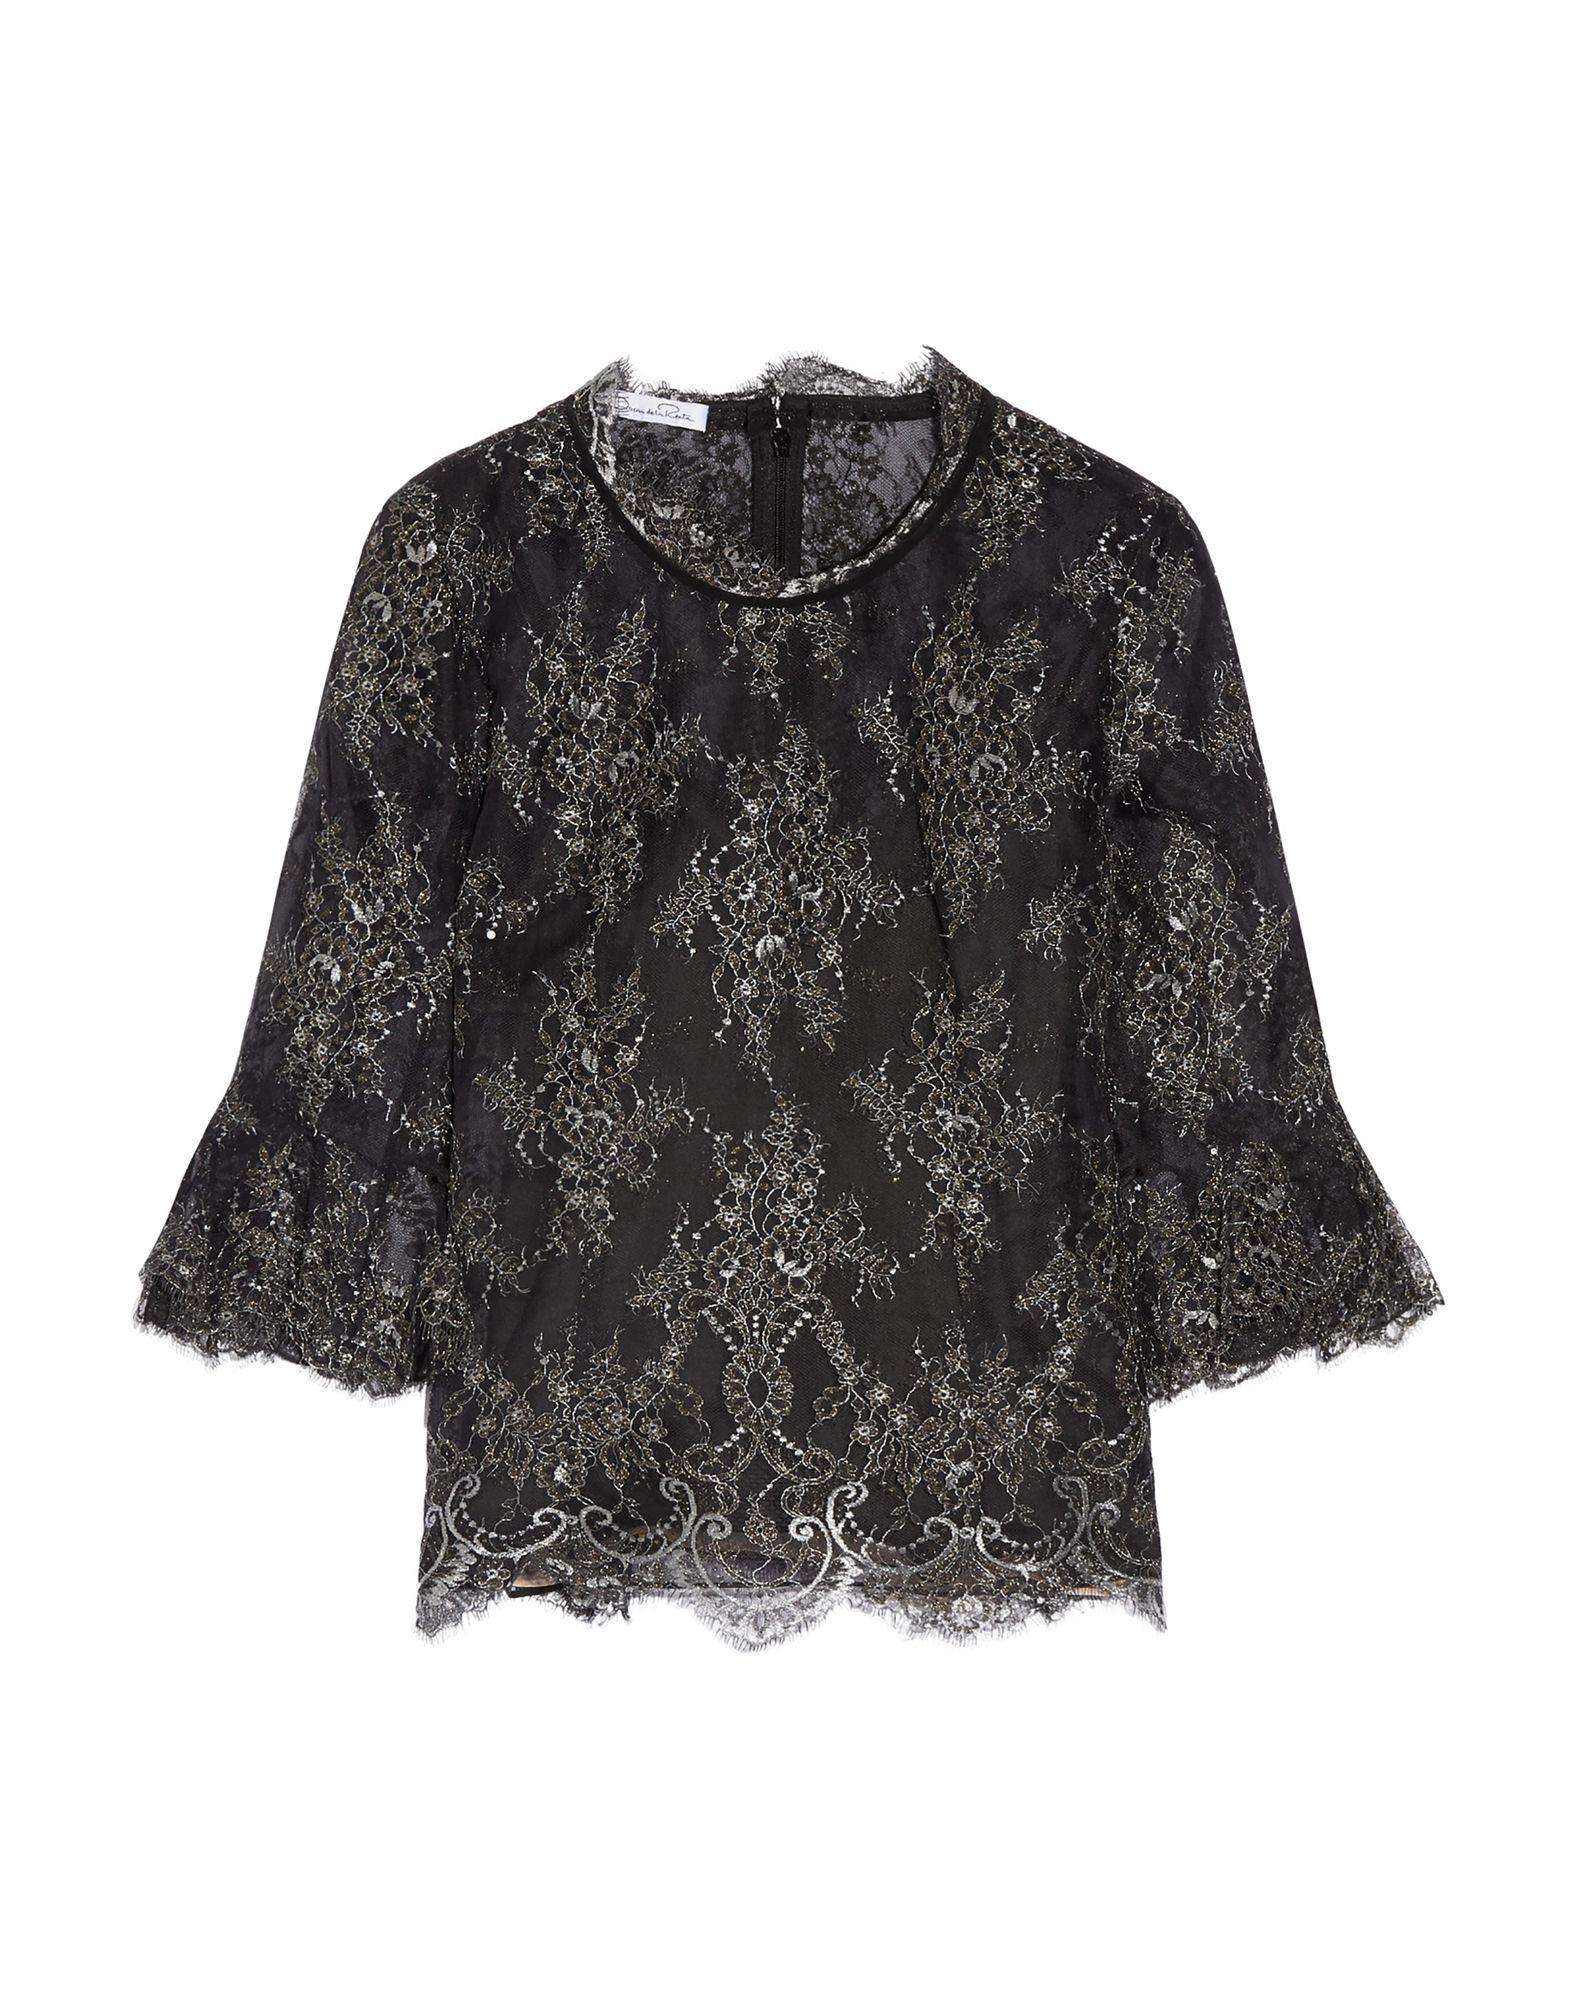 OSCAR DE LA RENTA Блузка ines de la fressange блузка